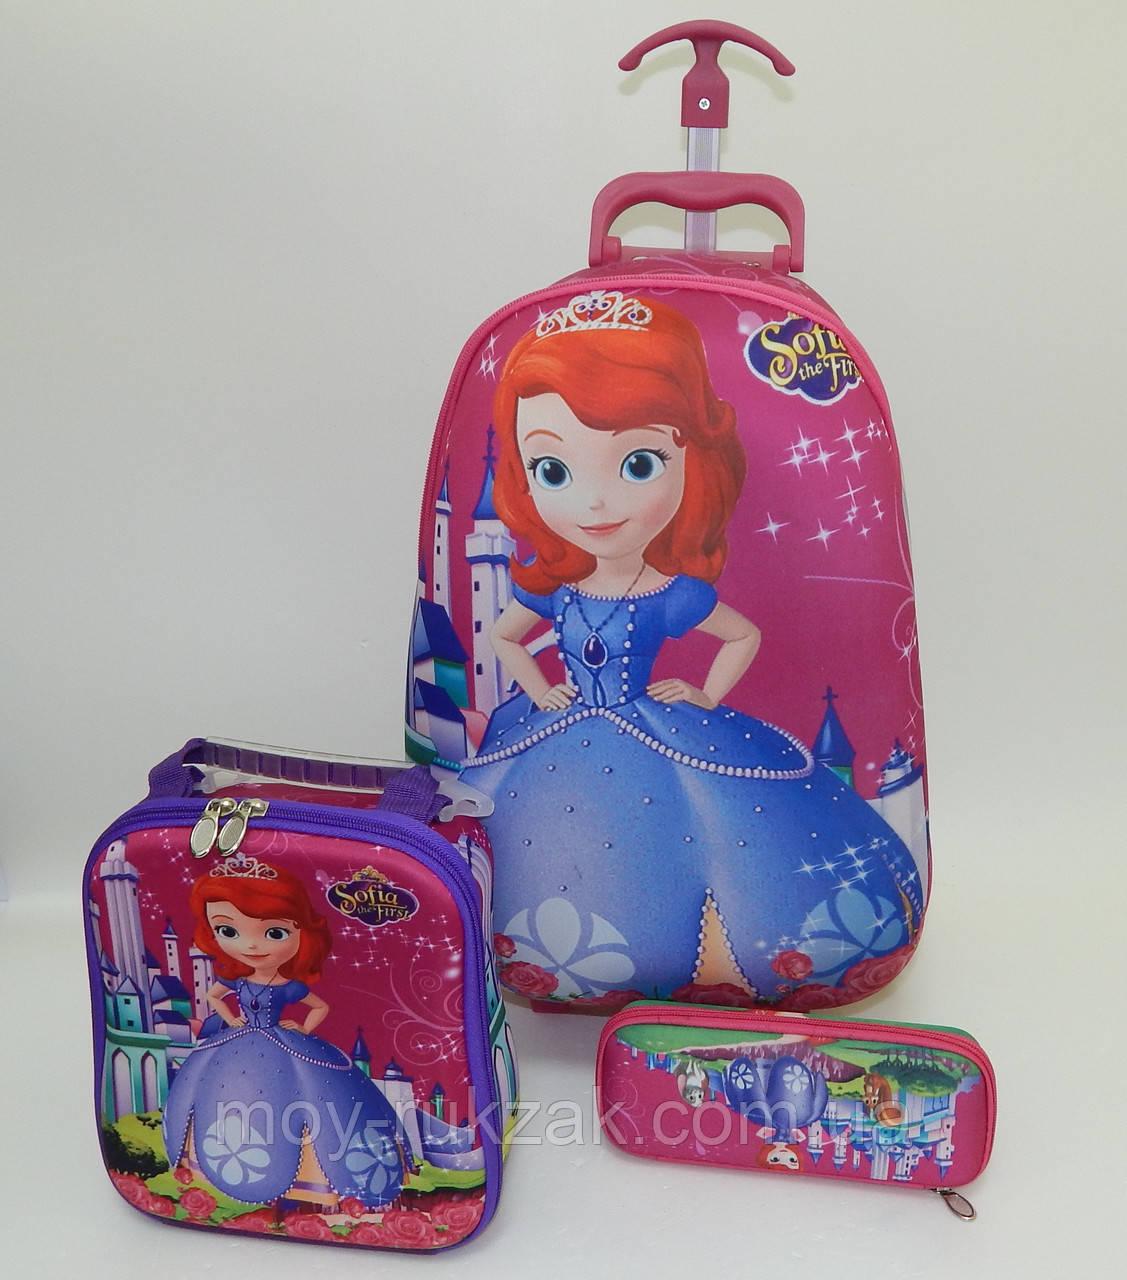 Набор детский чемодан на 6 колесах + сумка + пенал, София, Sofia the First